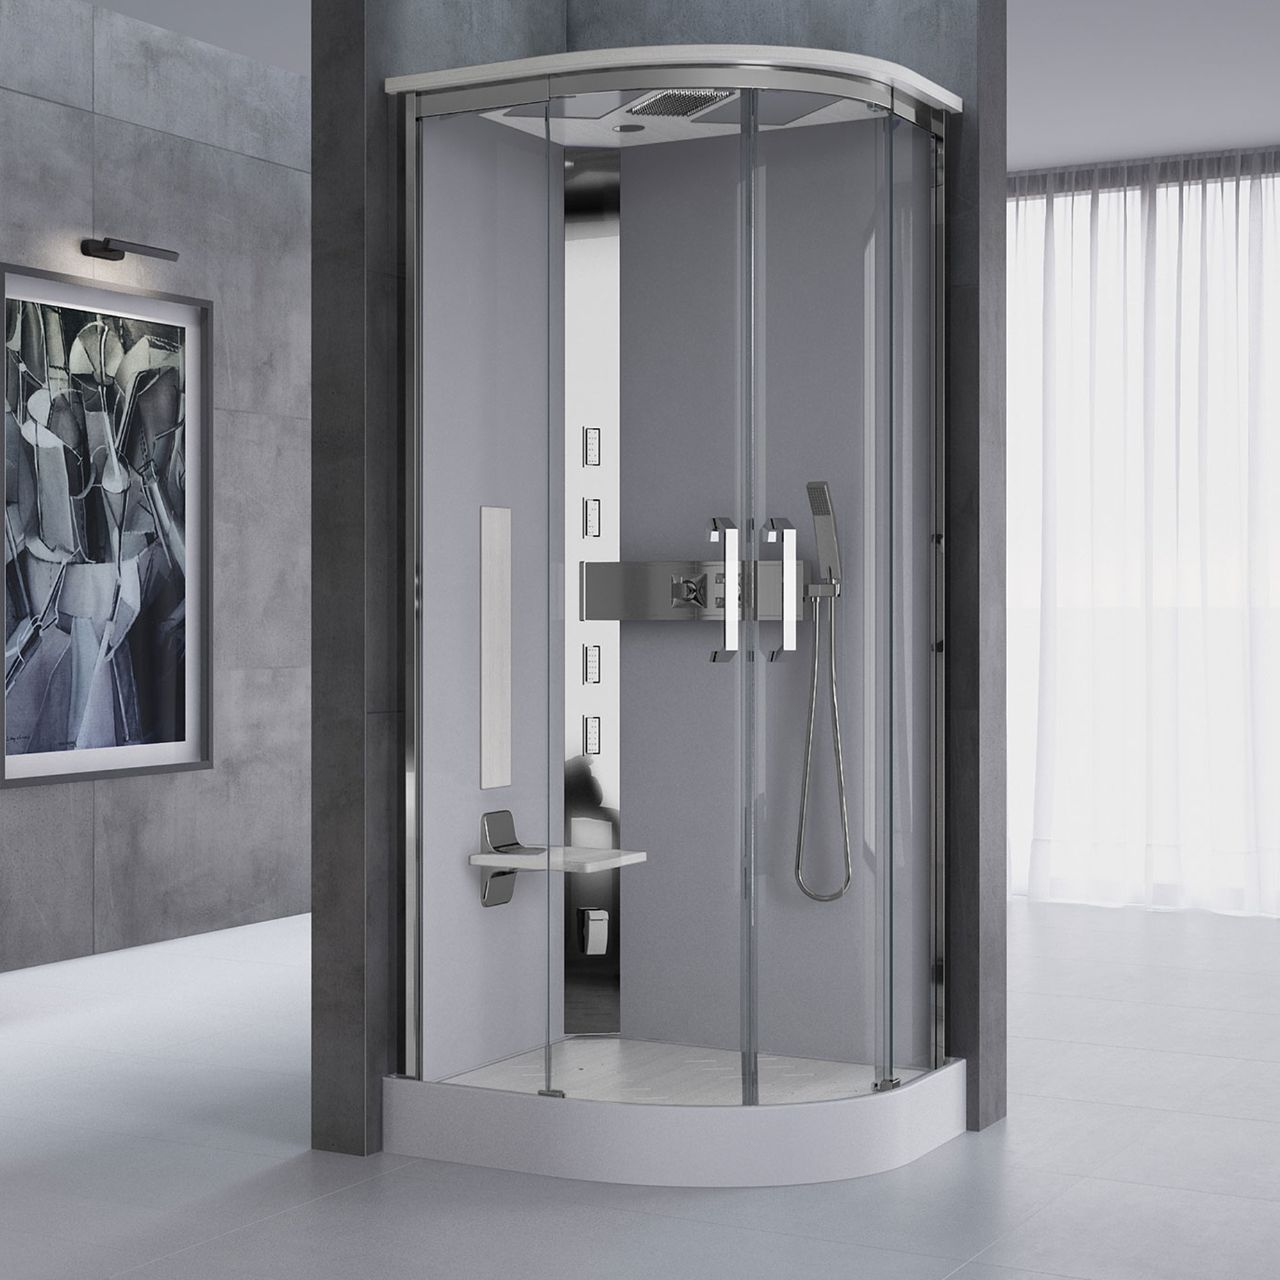 Cabinas De Ducha Novellini:Novellini Shower Cubicle